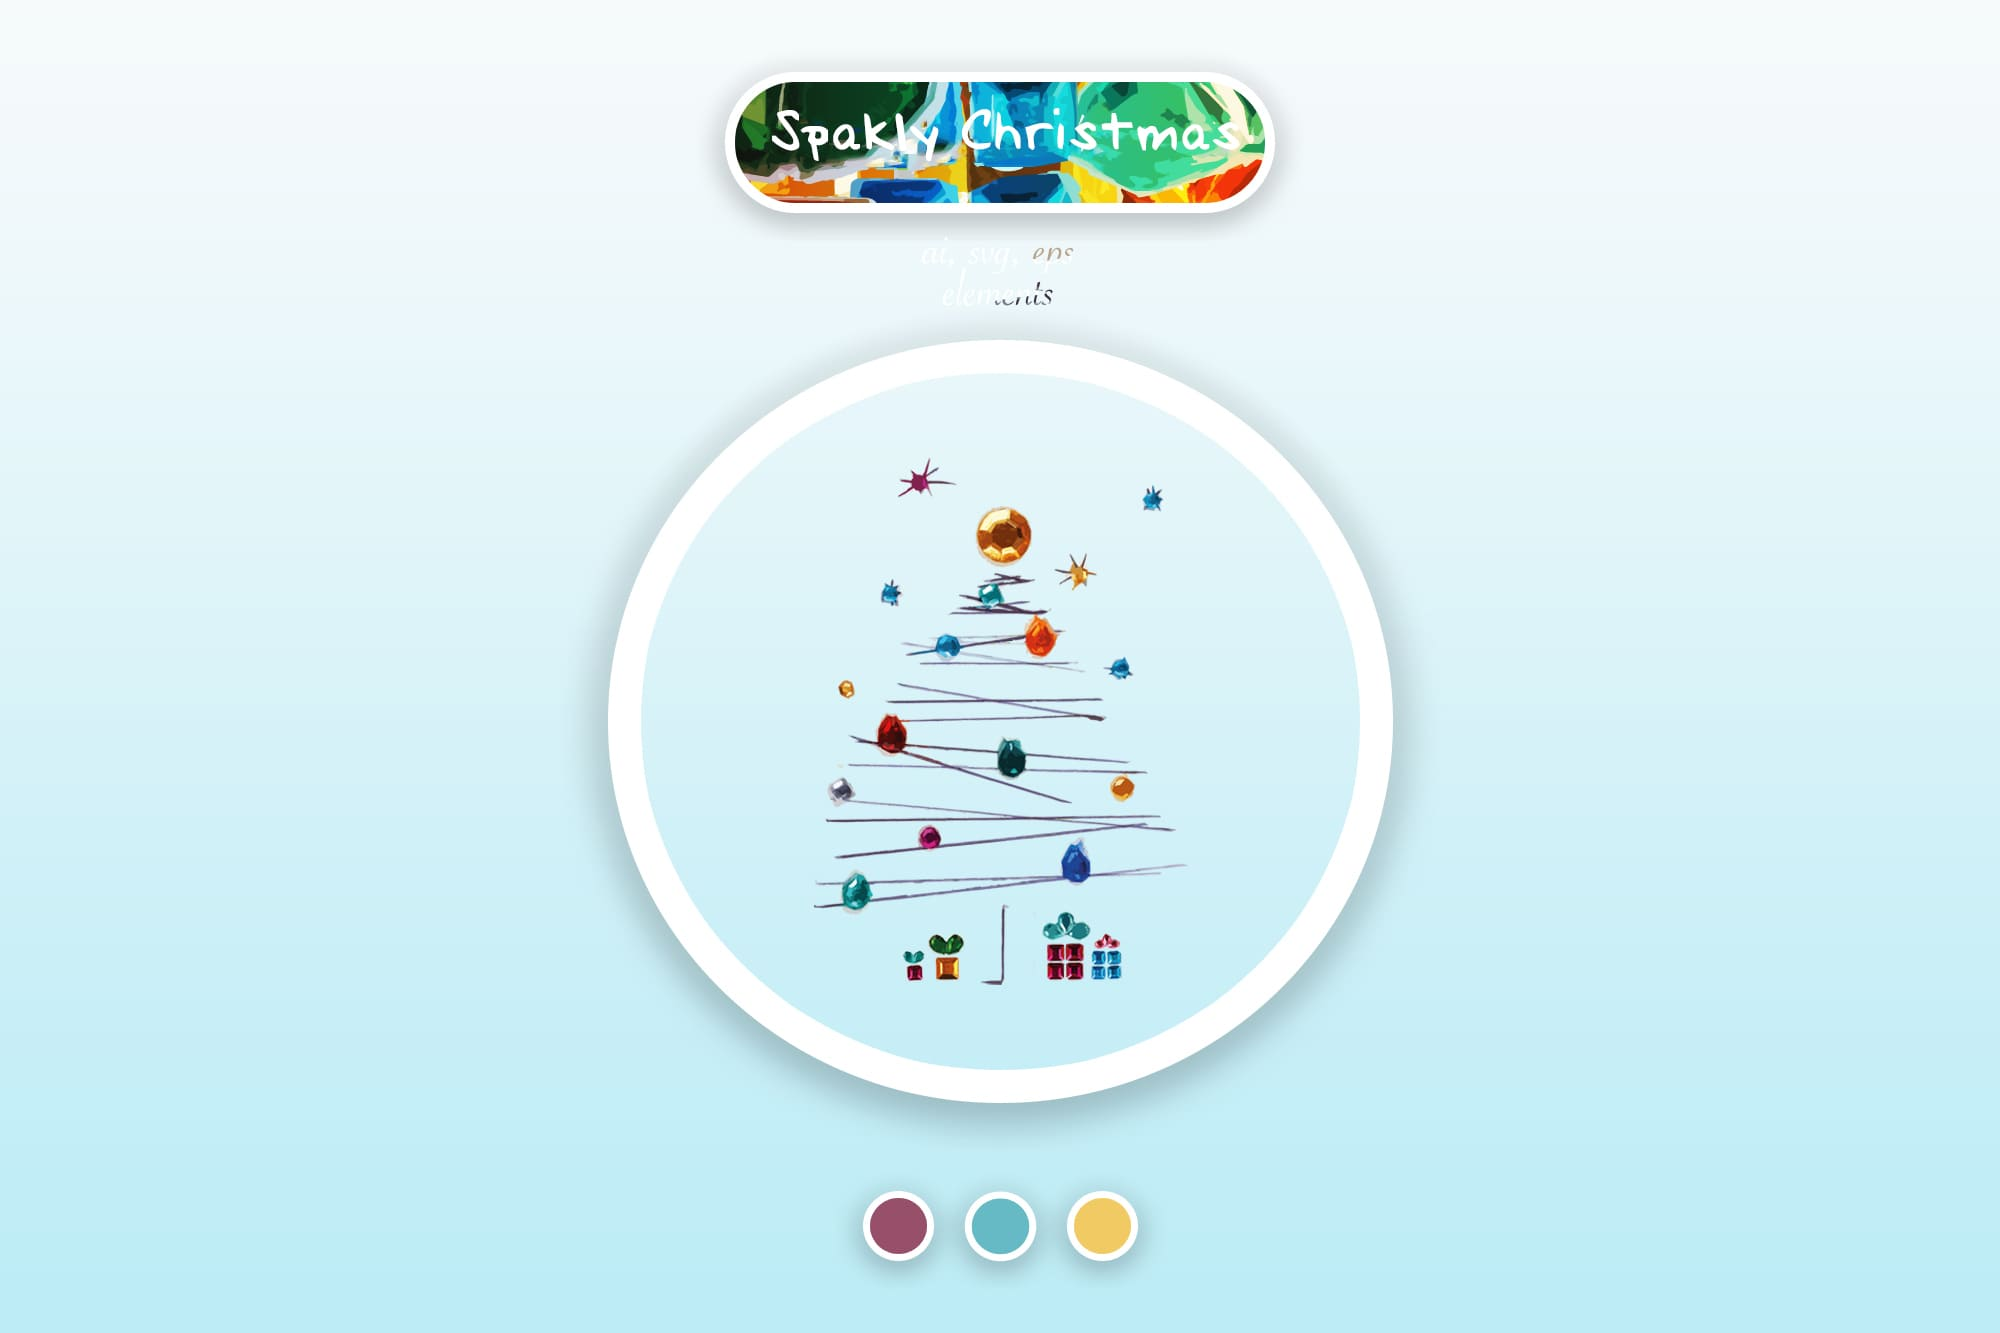 496 Christmas Illustrations: Christmas Vectors Bundle SVG, EPS, AI - Sparkly Christmas a